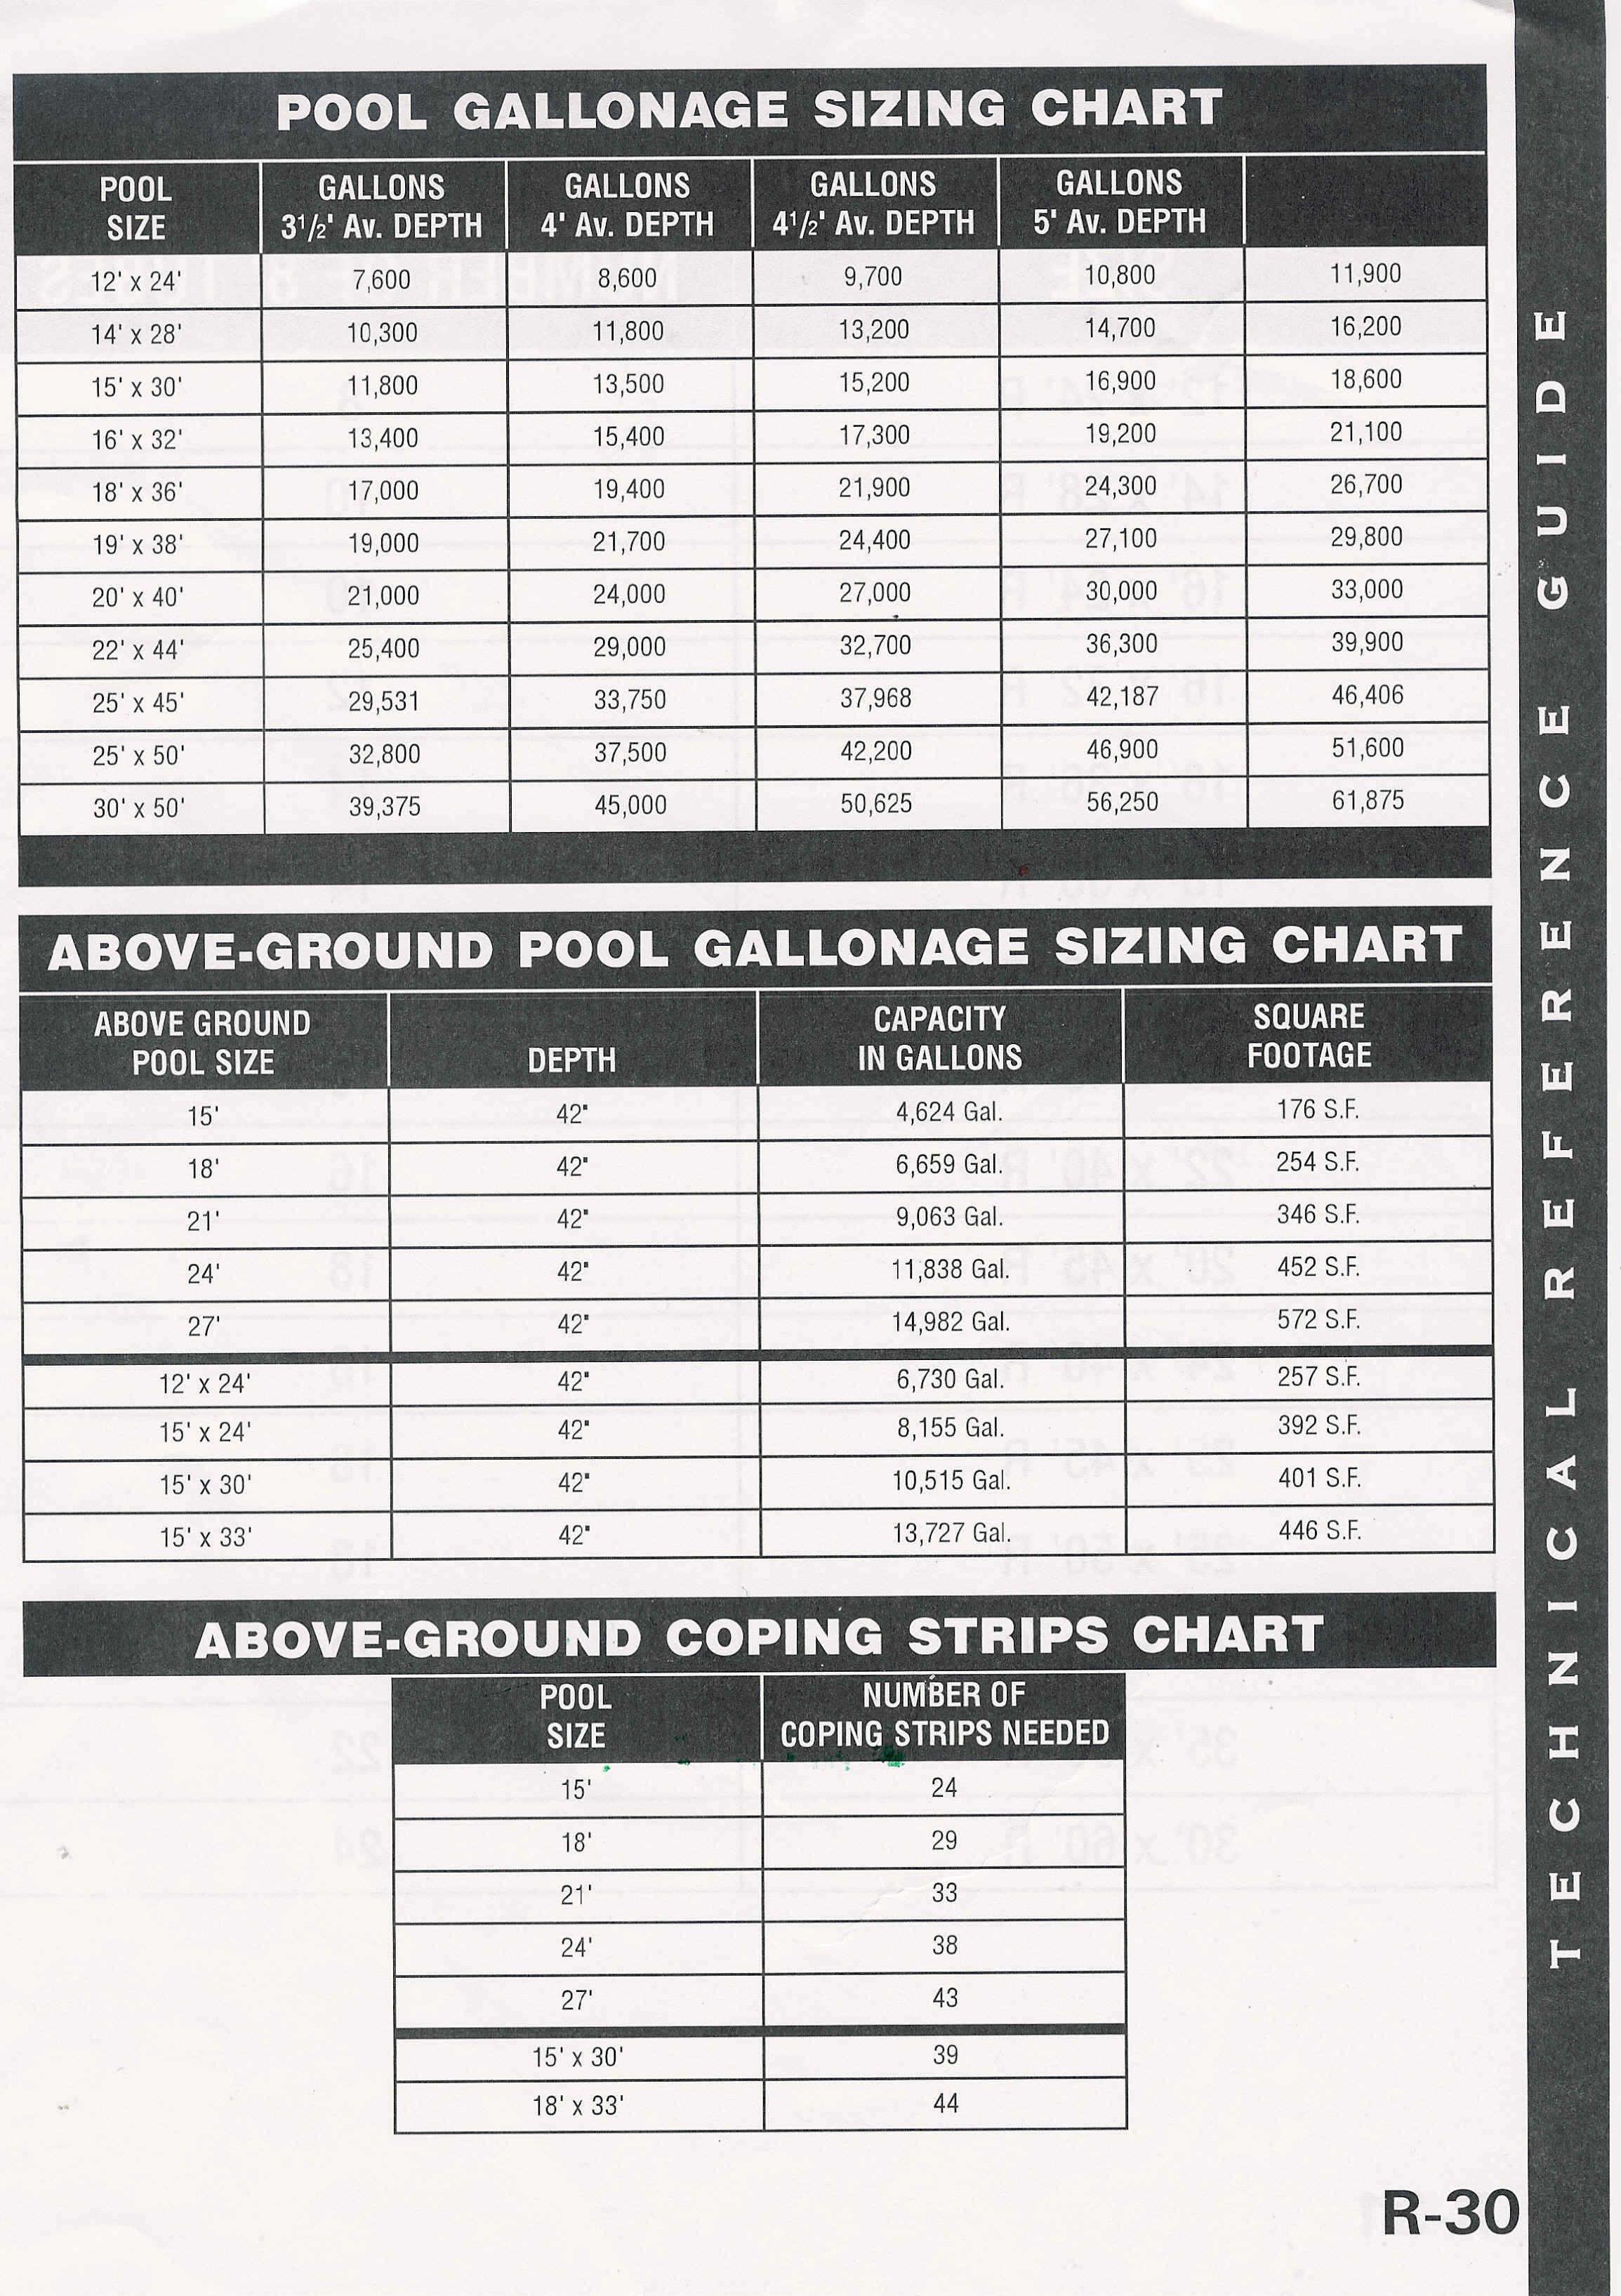 Pump Size Chart Pool Gallons Sizing Chart